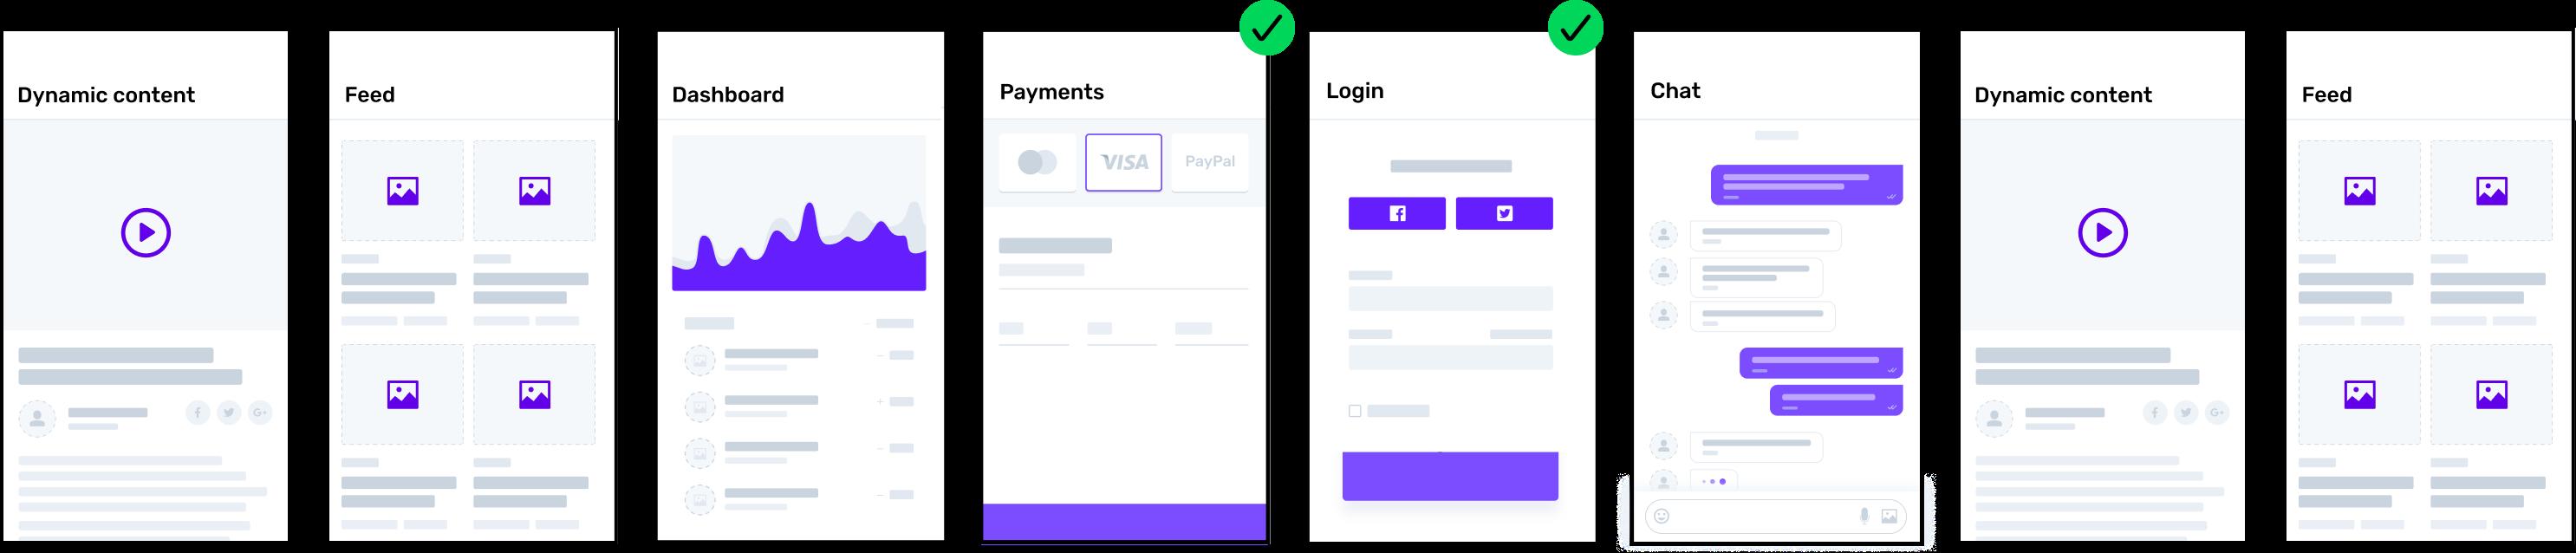 App prototype screens